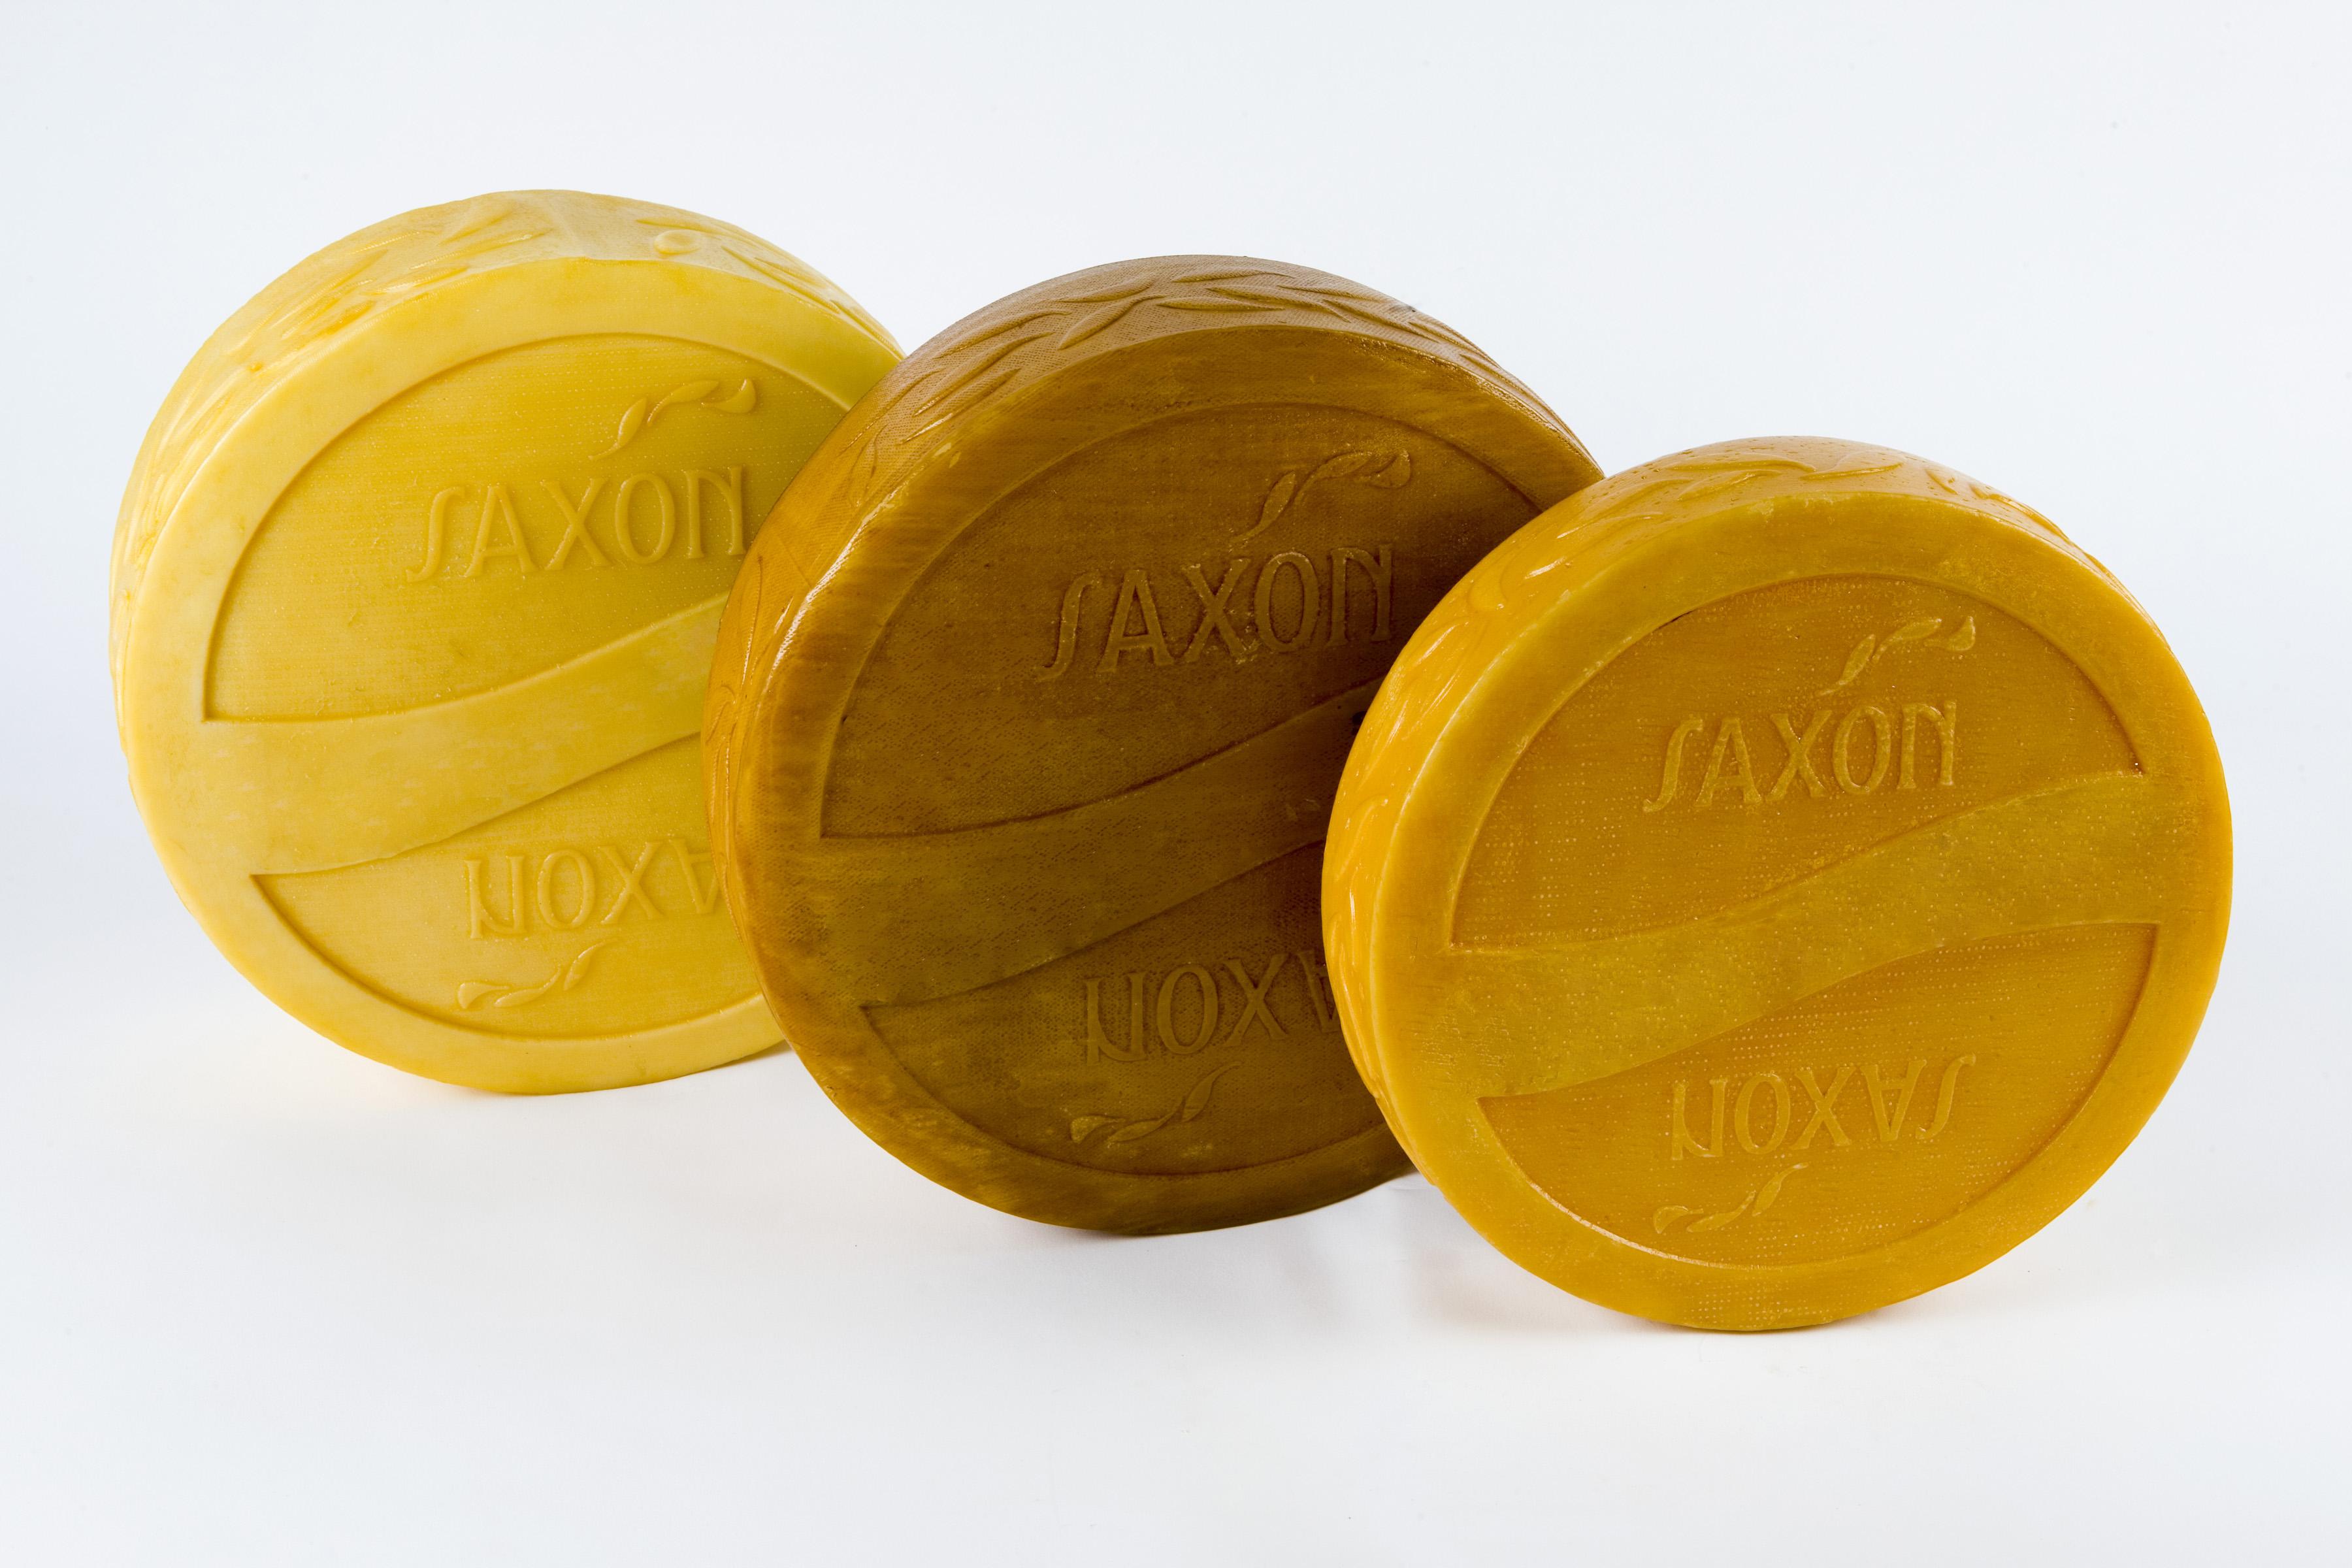 Wheels of Saxon cheese